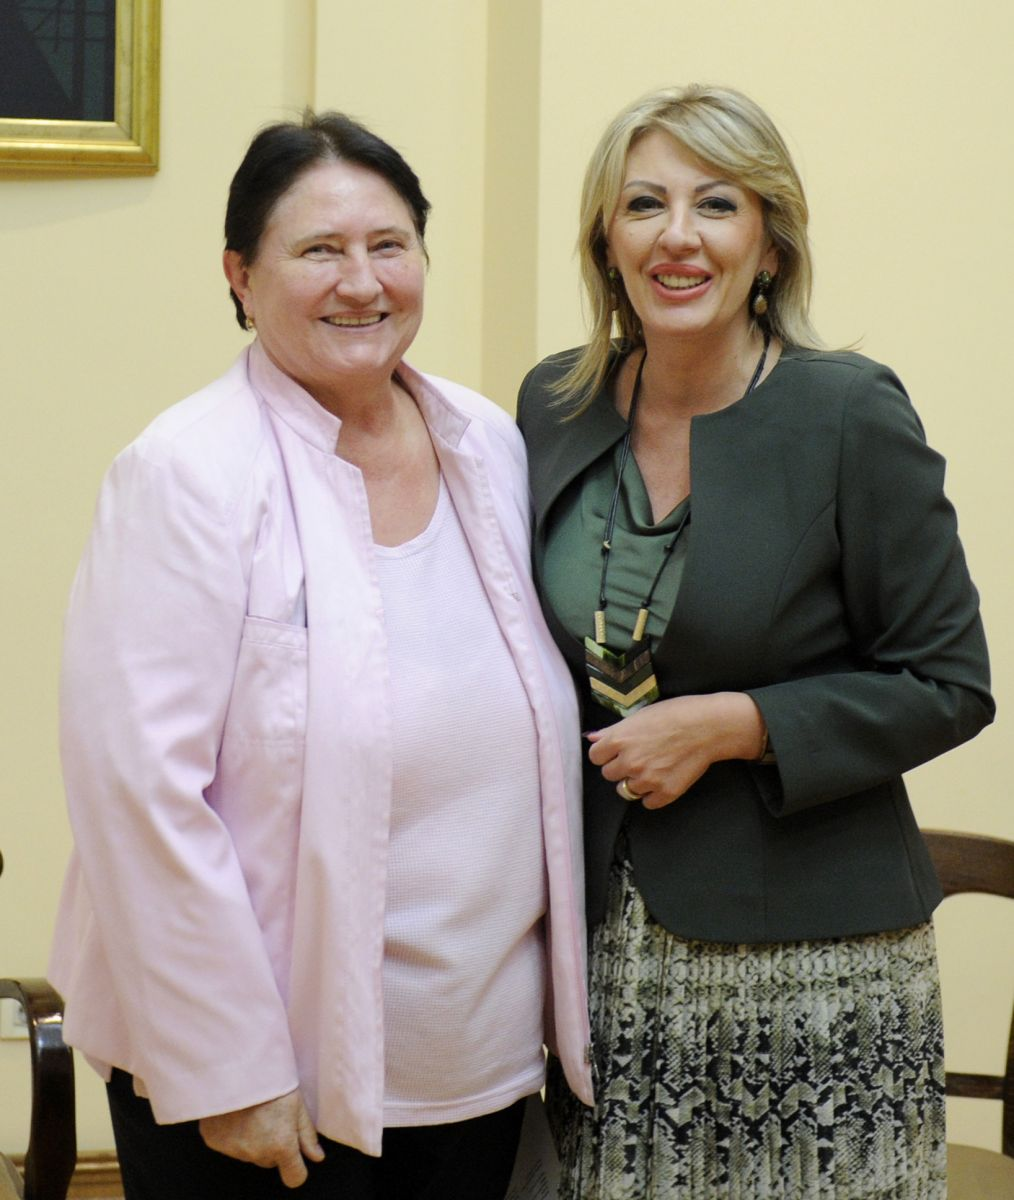 J. Joksimović and Repčeková: Slovakia – a consistent friend of Serbia and the enlargement policy